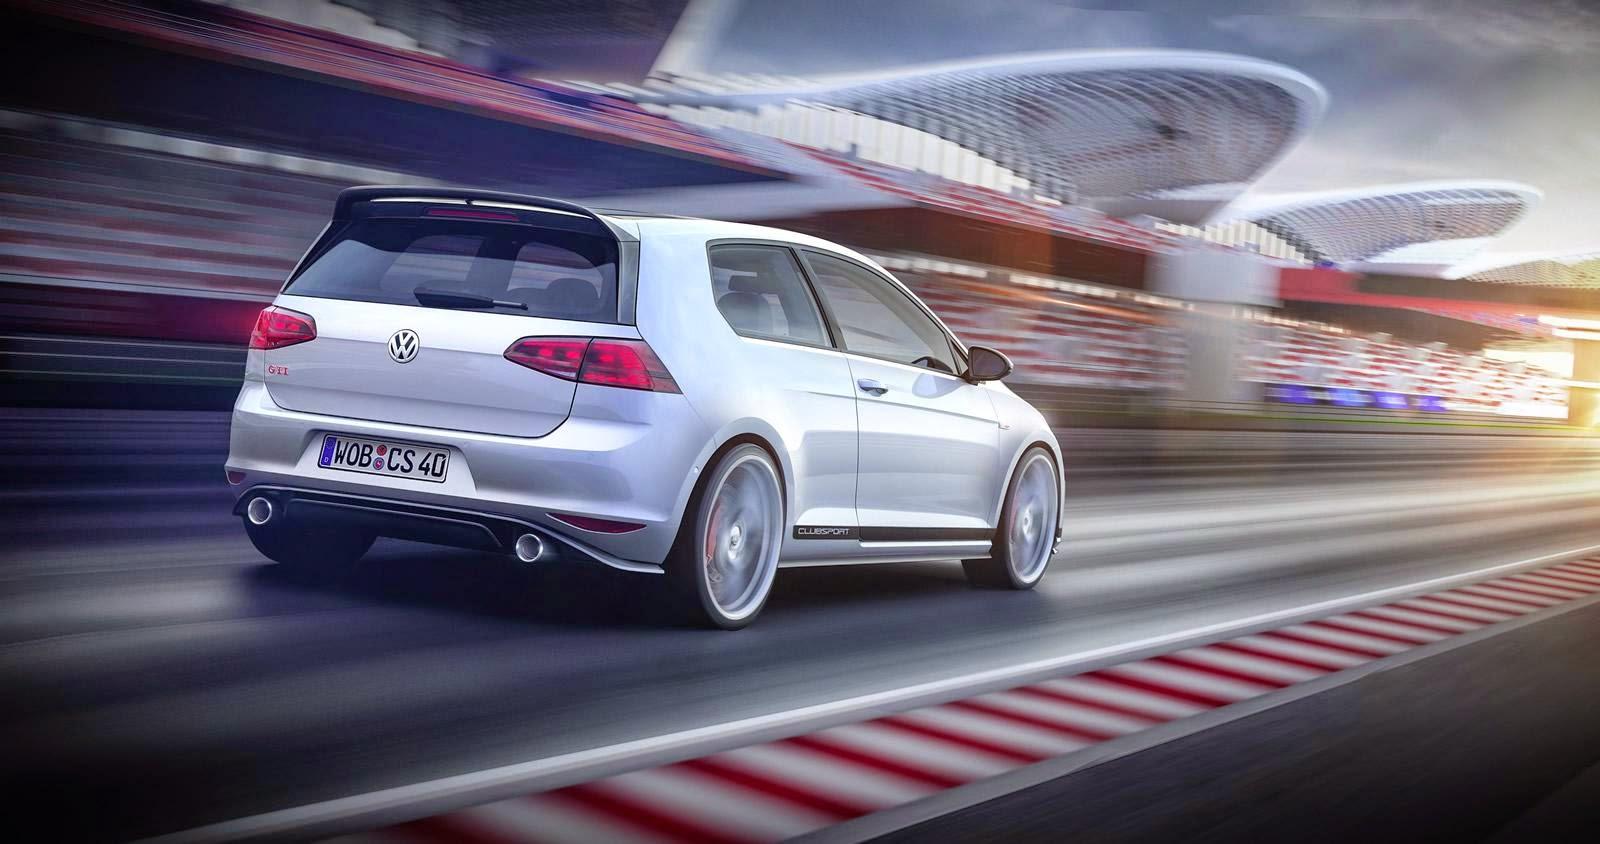 [Resim: Volkswagen%2BGolf%2BGTI%2BClubsport%2B2.jpg]